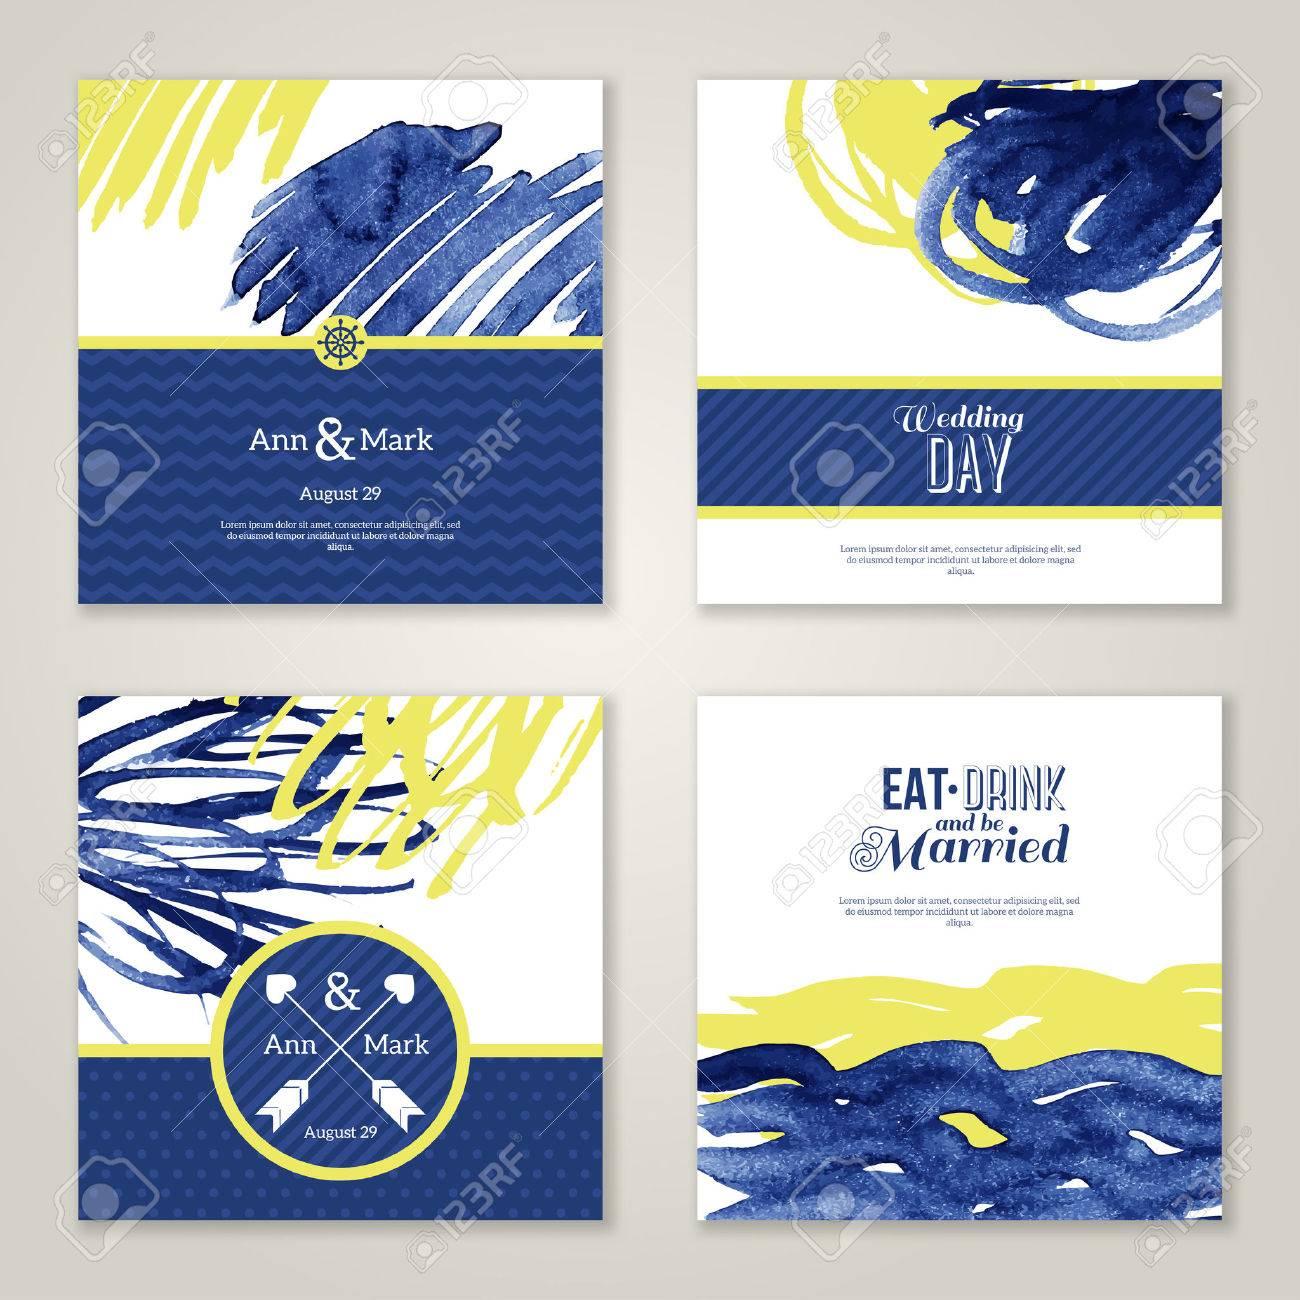 Set of watercolor romantic wedding invitations. Vector illustration. Hand drawn design elements in marine